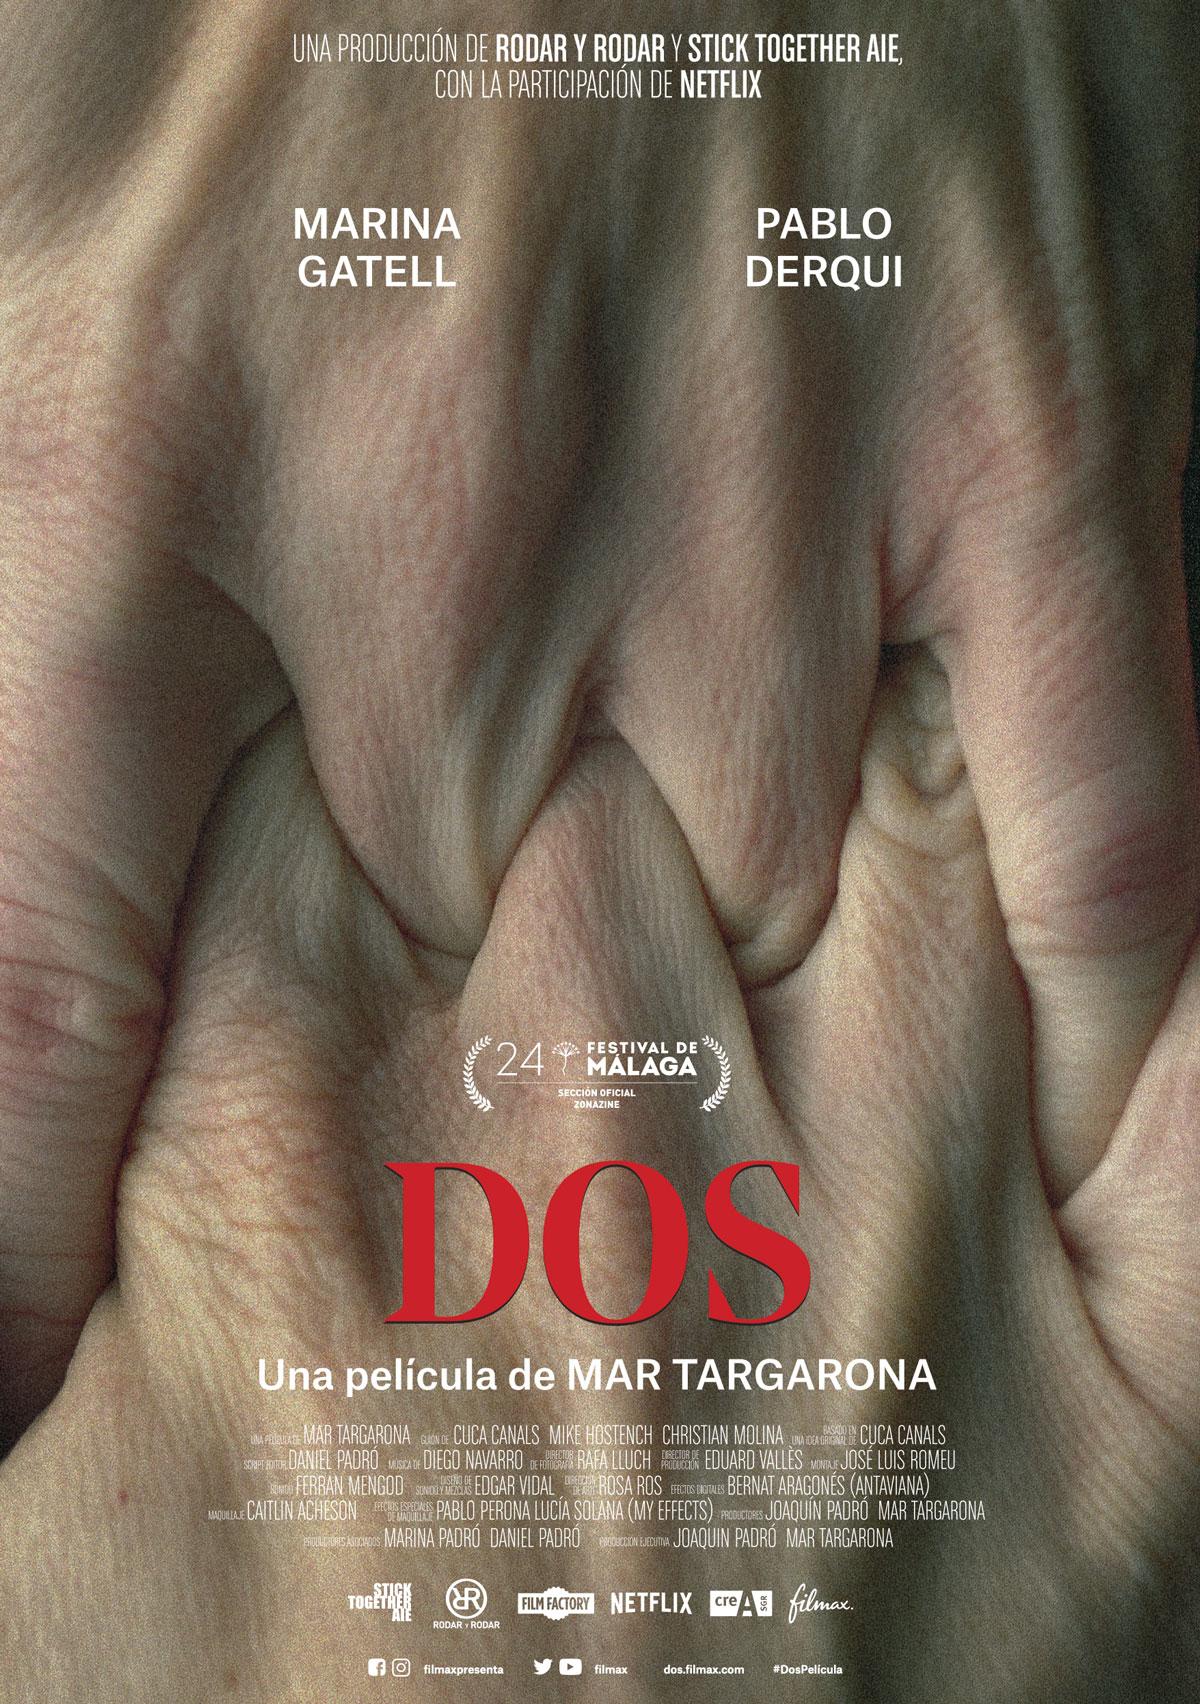 DOS-Cartel-FestivalMálaga_2021_ostproducció-Antaviana